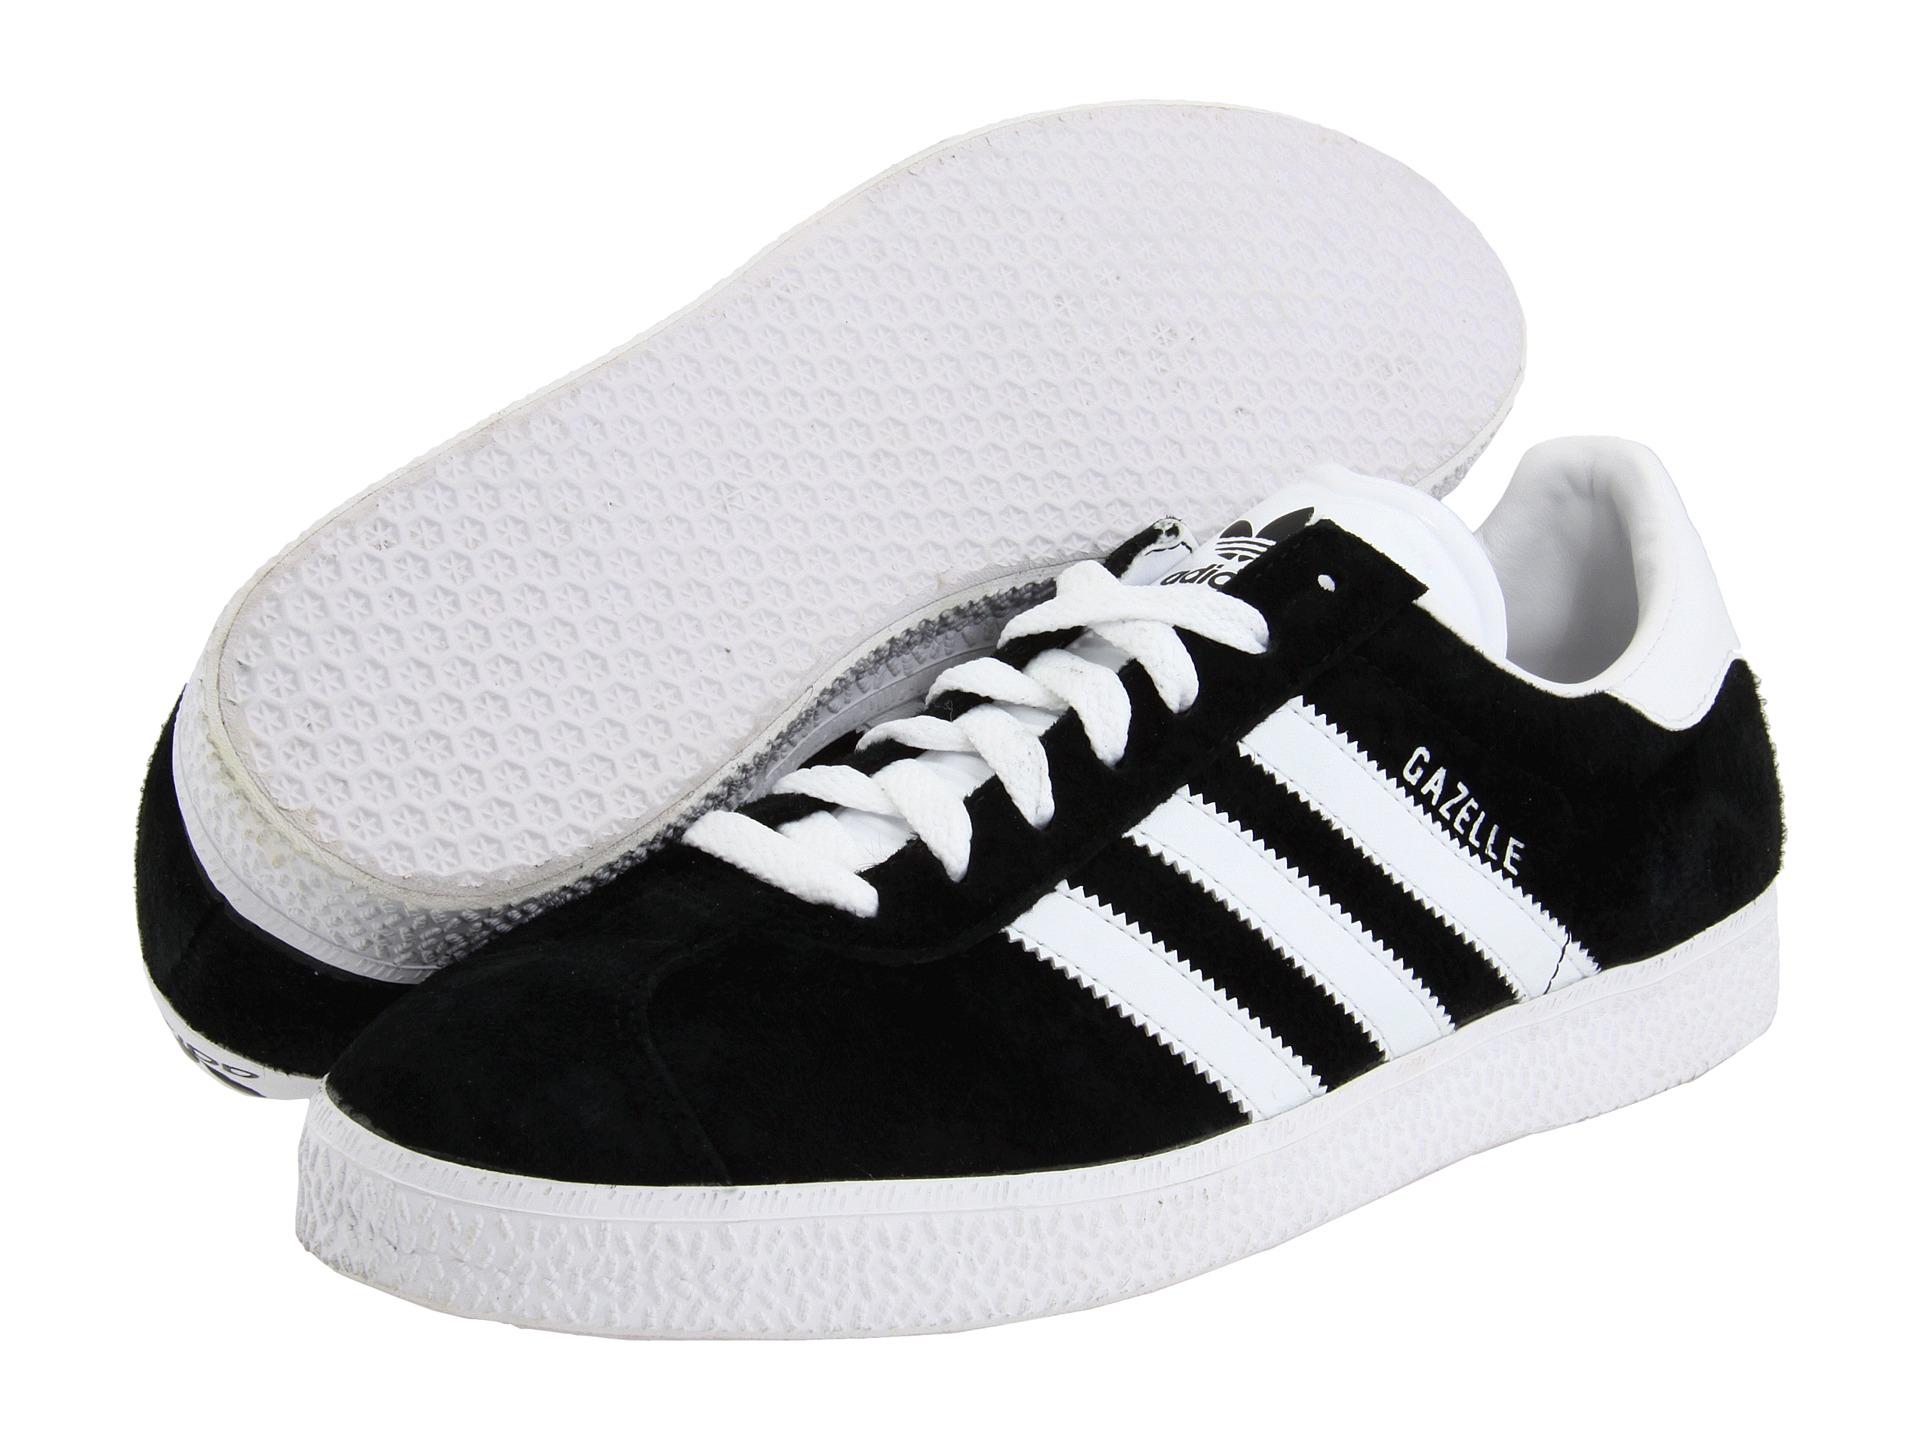 Adidas Originals Gazelle Zapposcom Free Shipping BOTH Ways